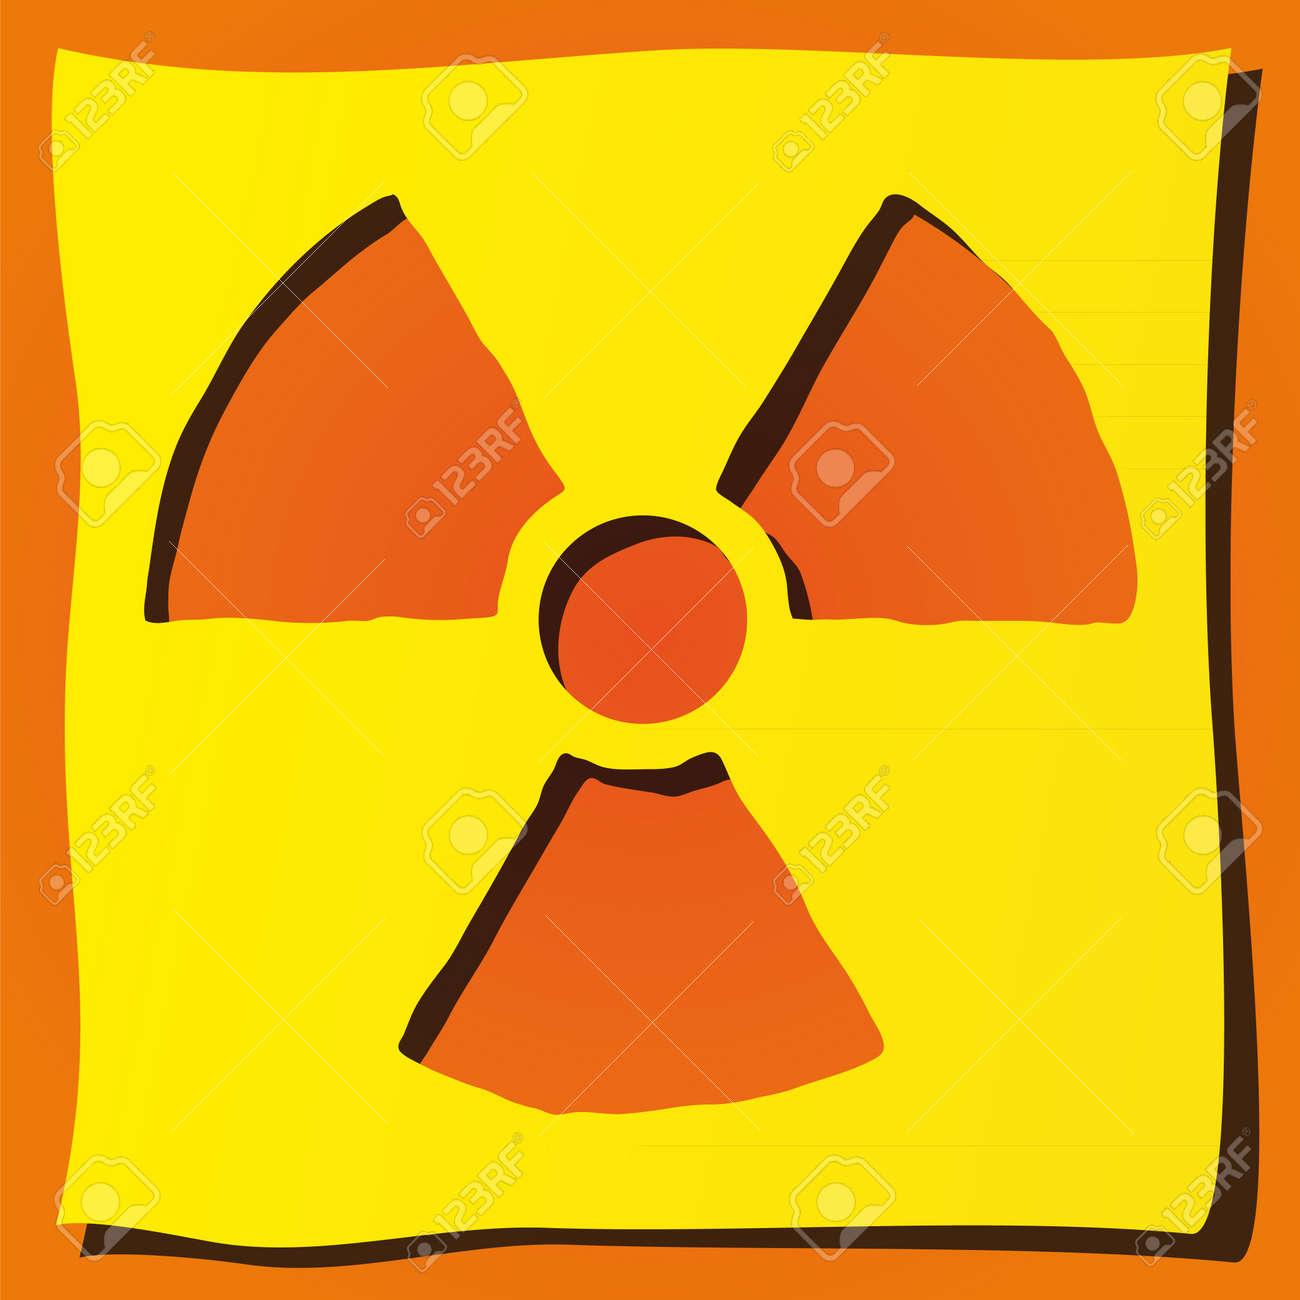 Radioactive symbol royalty free cliparts vectors and stock radioactive symbol stock vector 10736893 buycottarizona